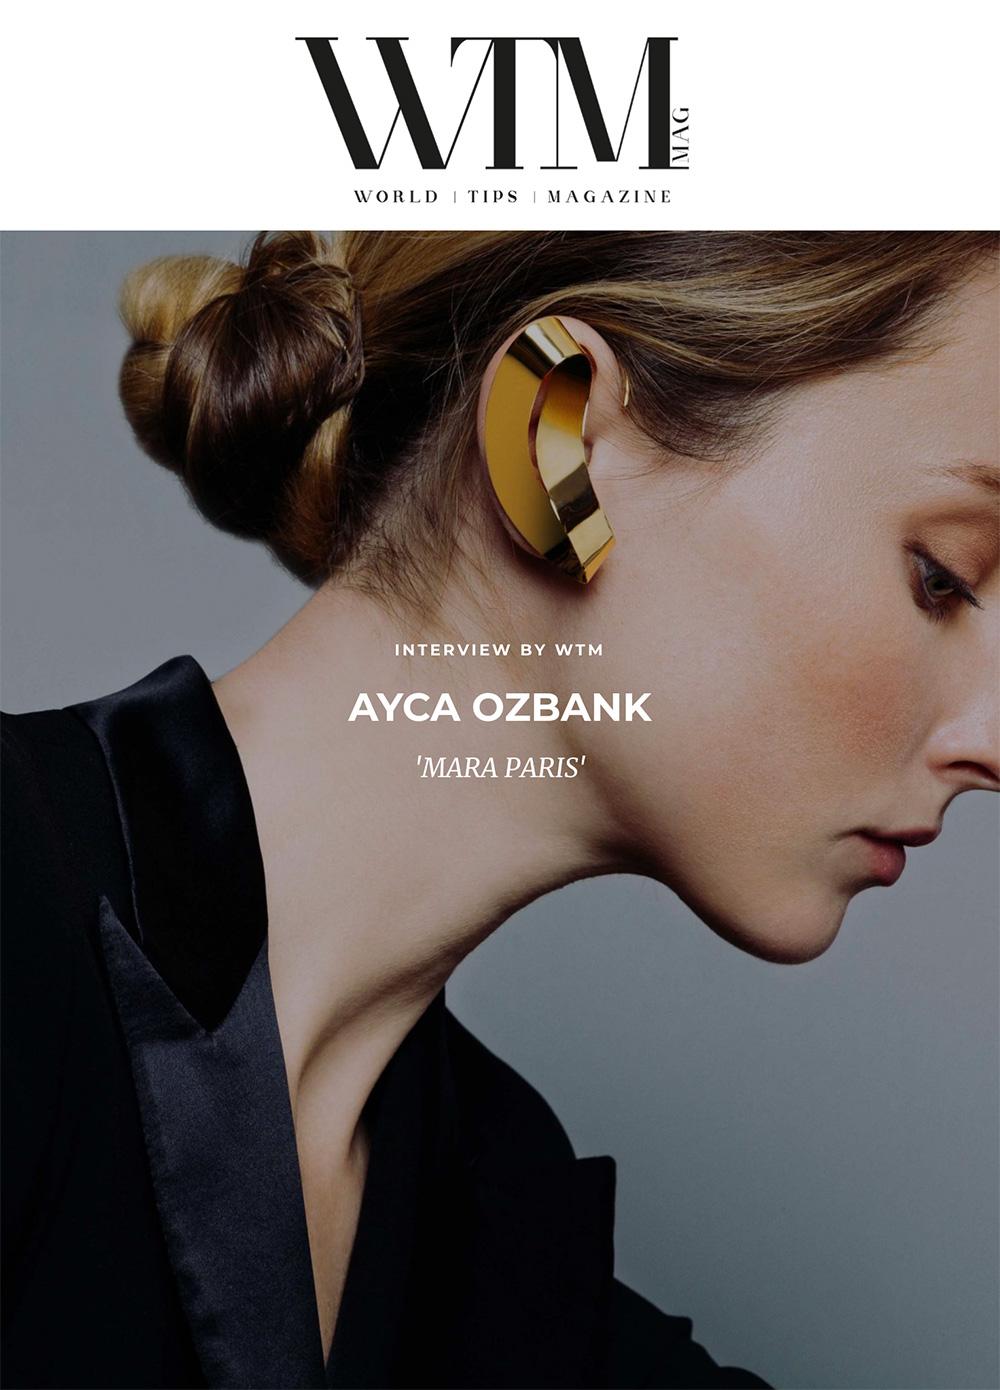 WTM Mag - Reportage par WTM avec Ayca Ozbank - Mara Paris